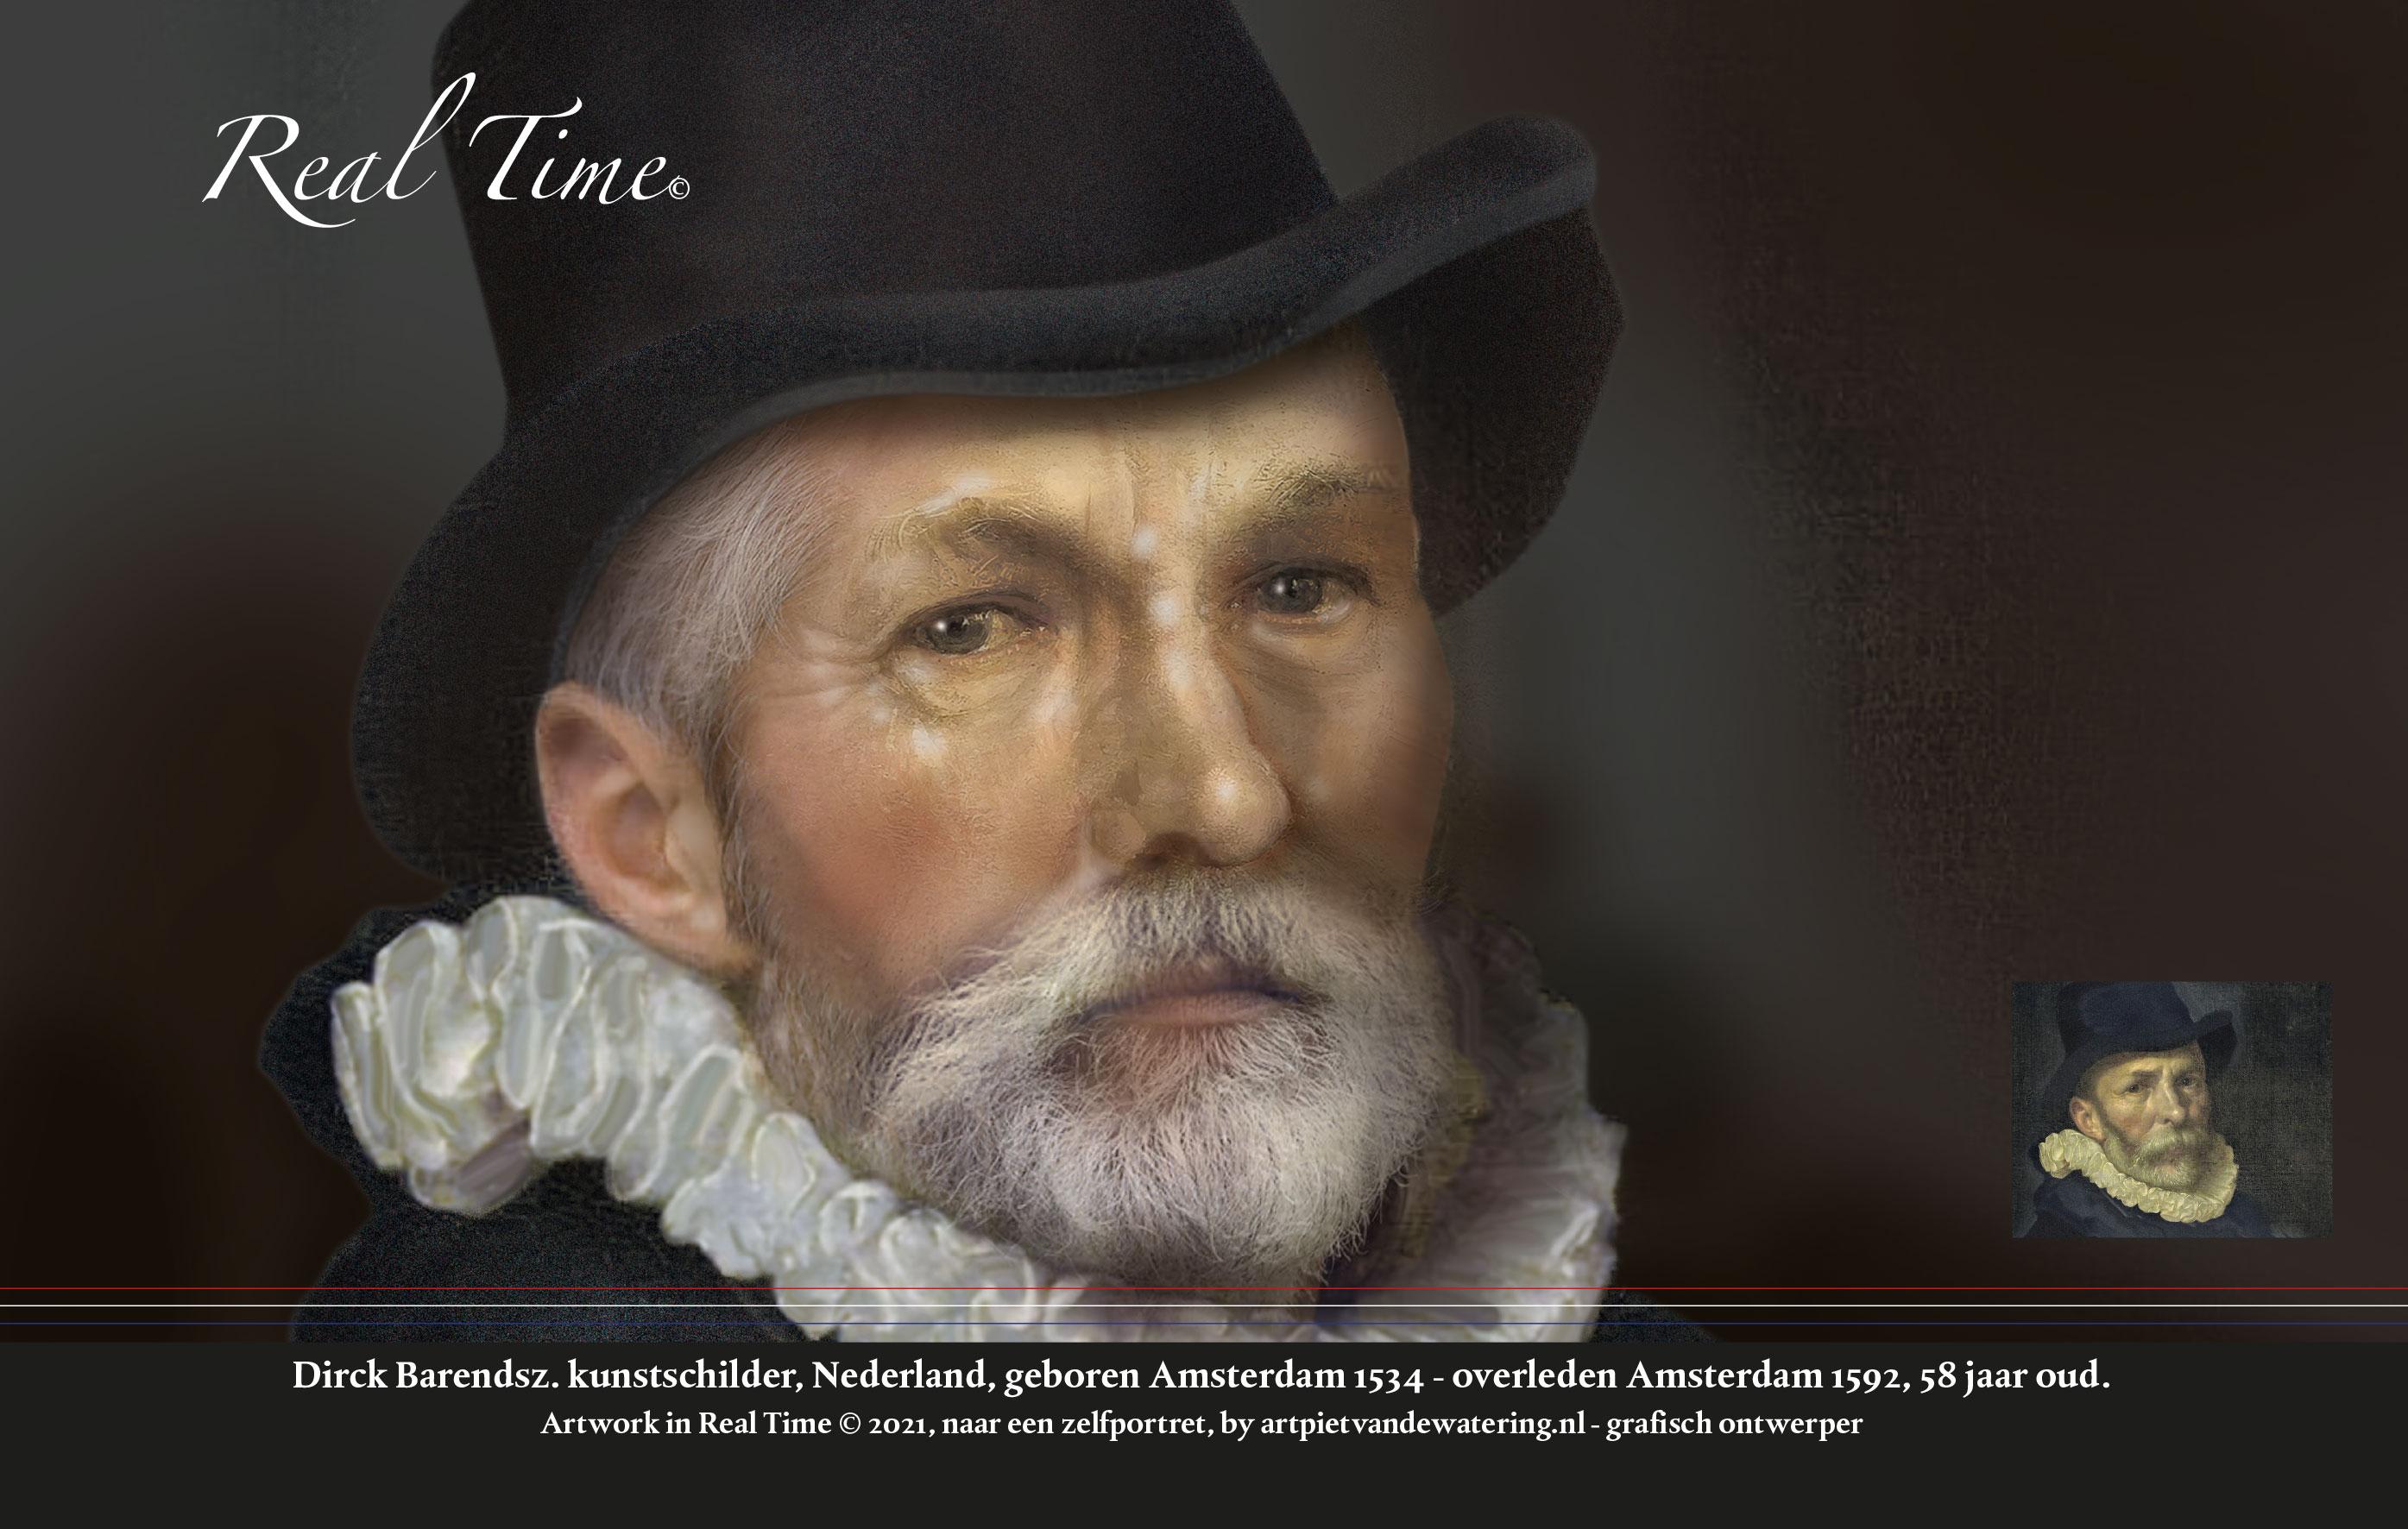 Dirck-Barendsz-1534-1592